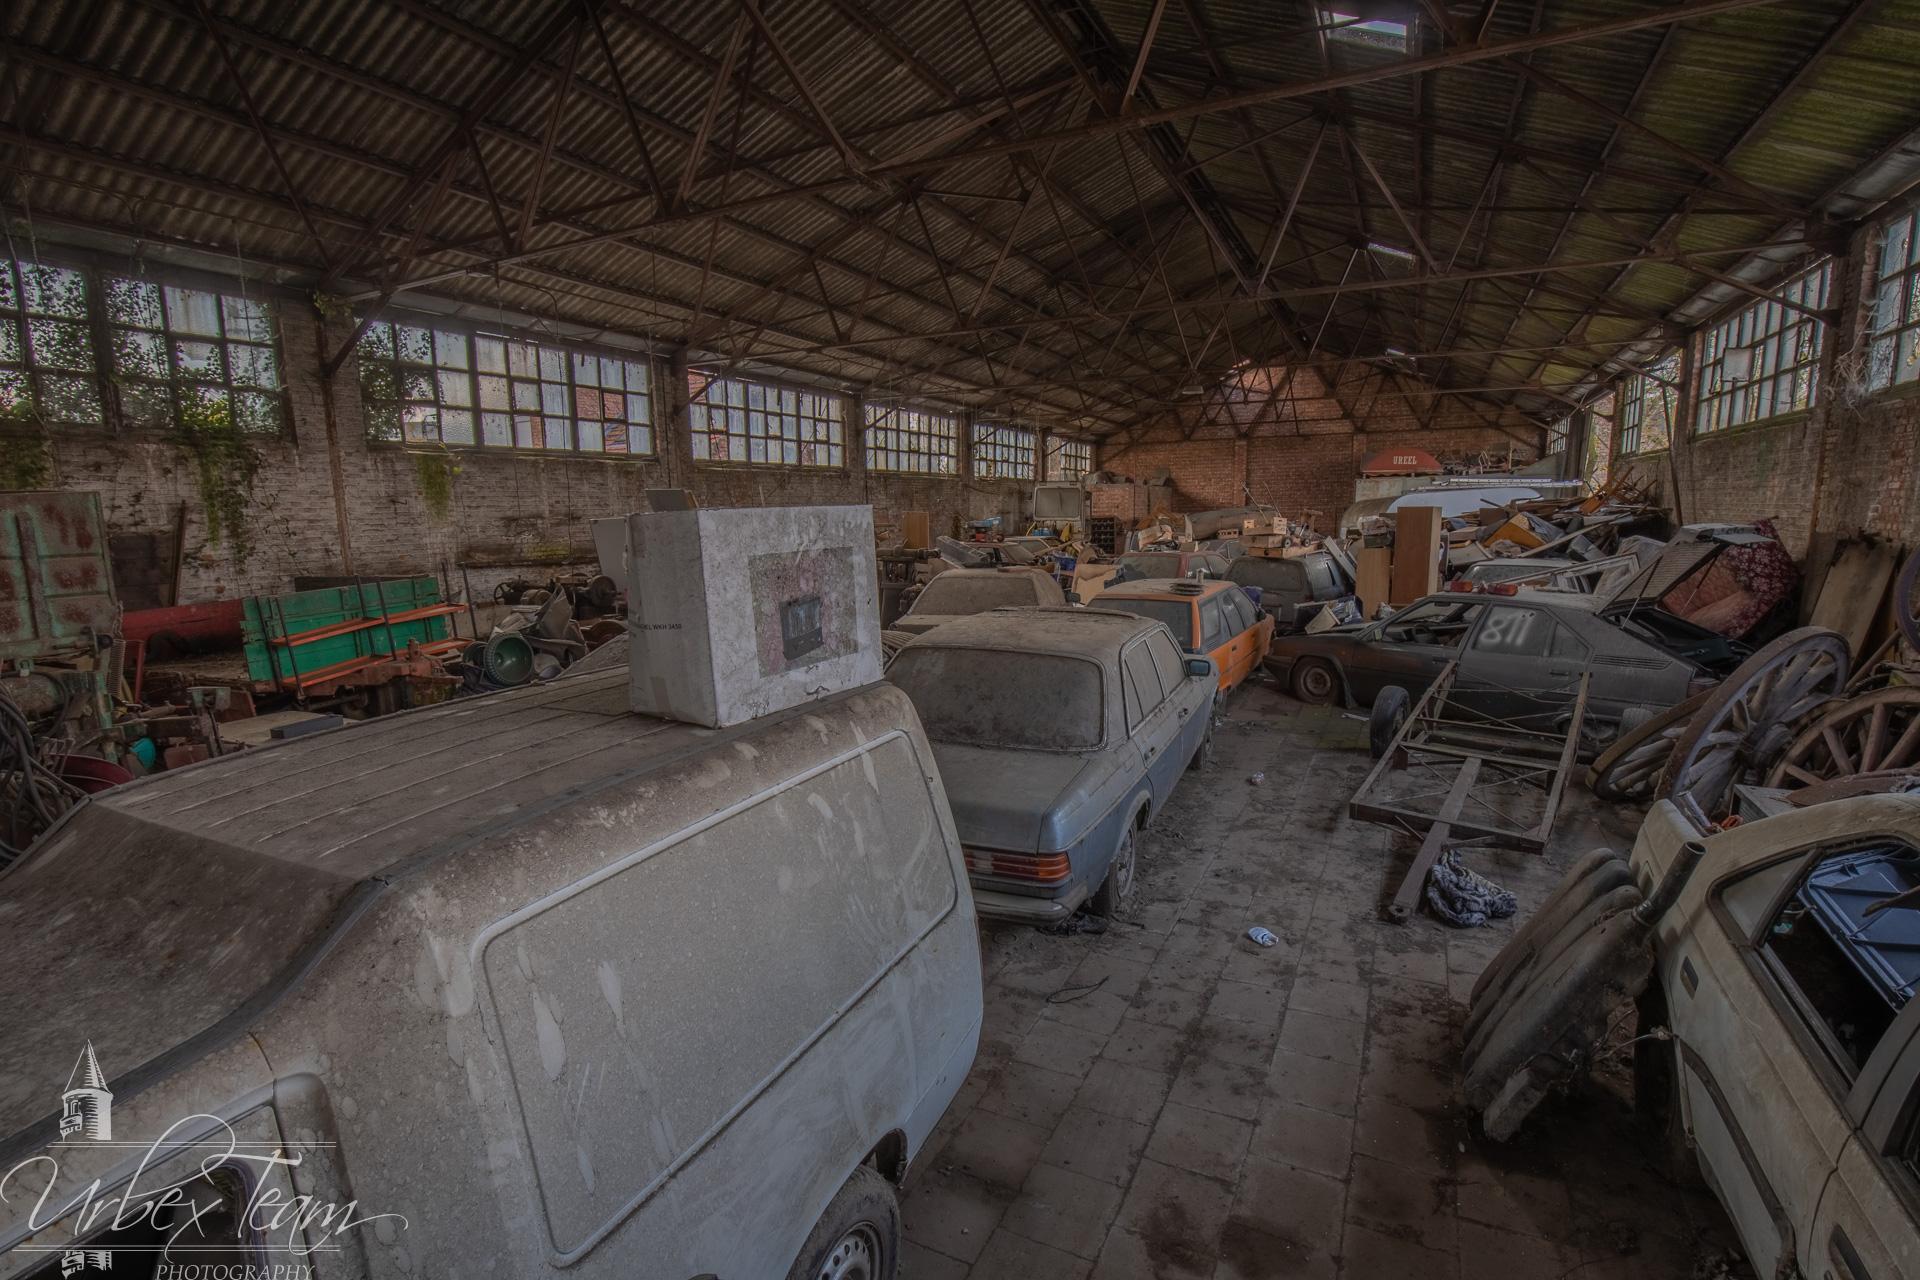 Ureel Cars